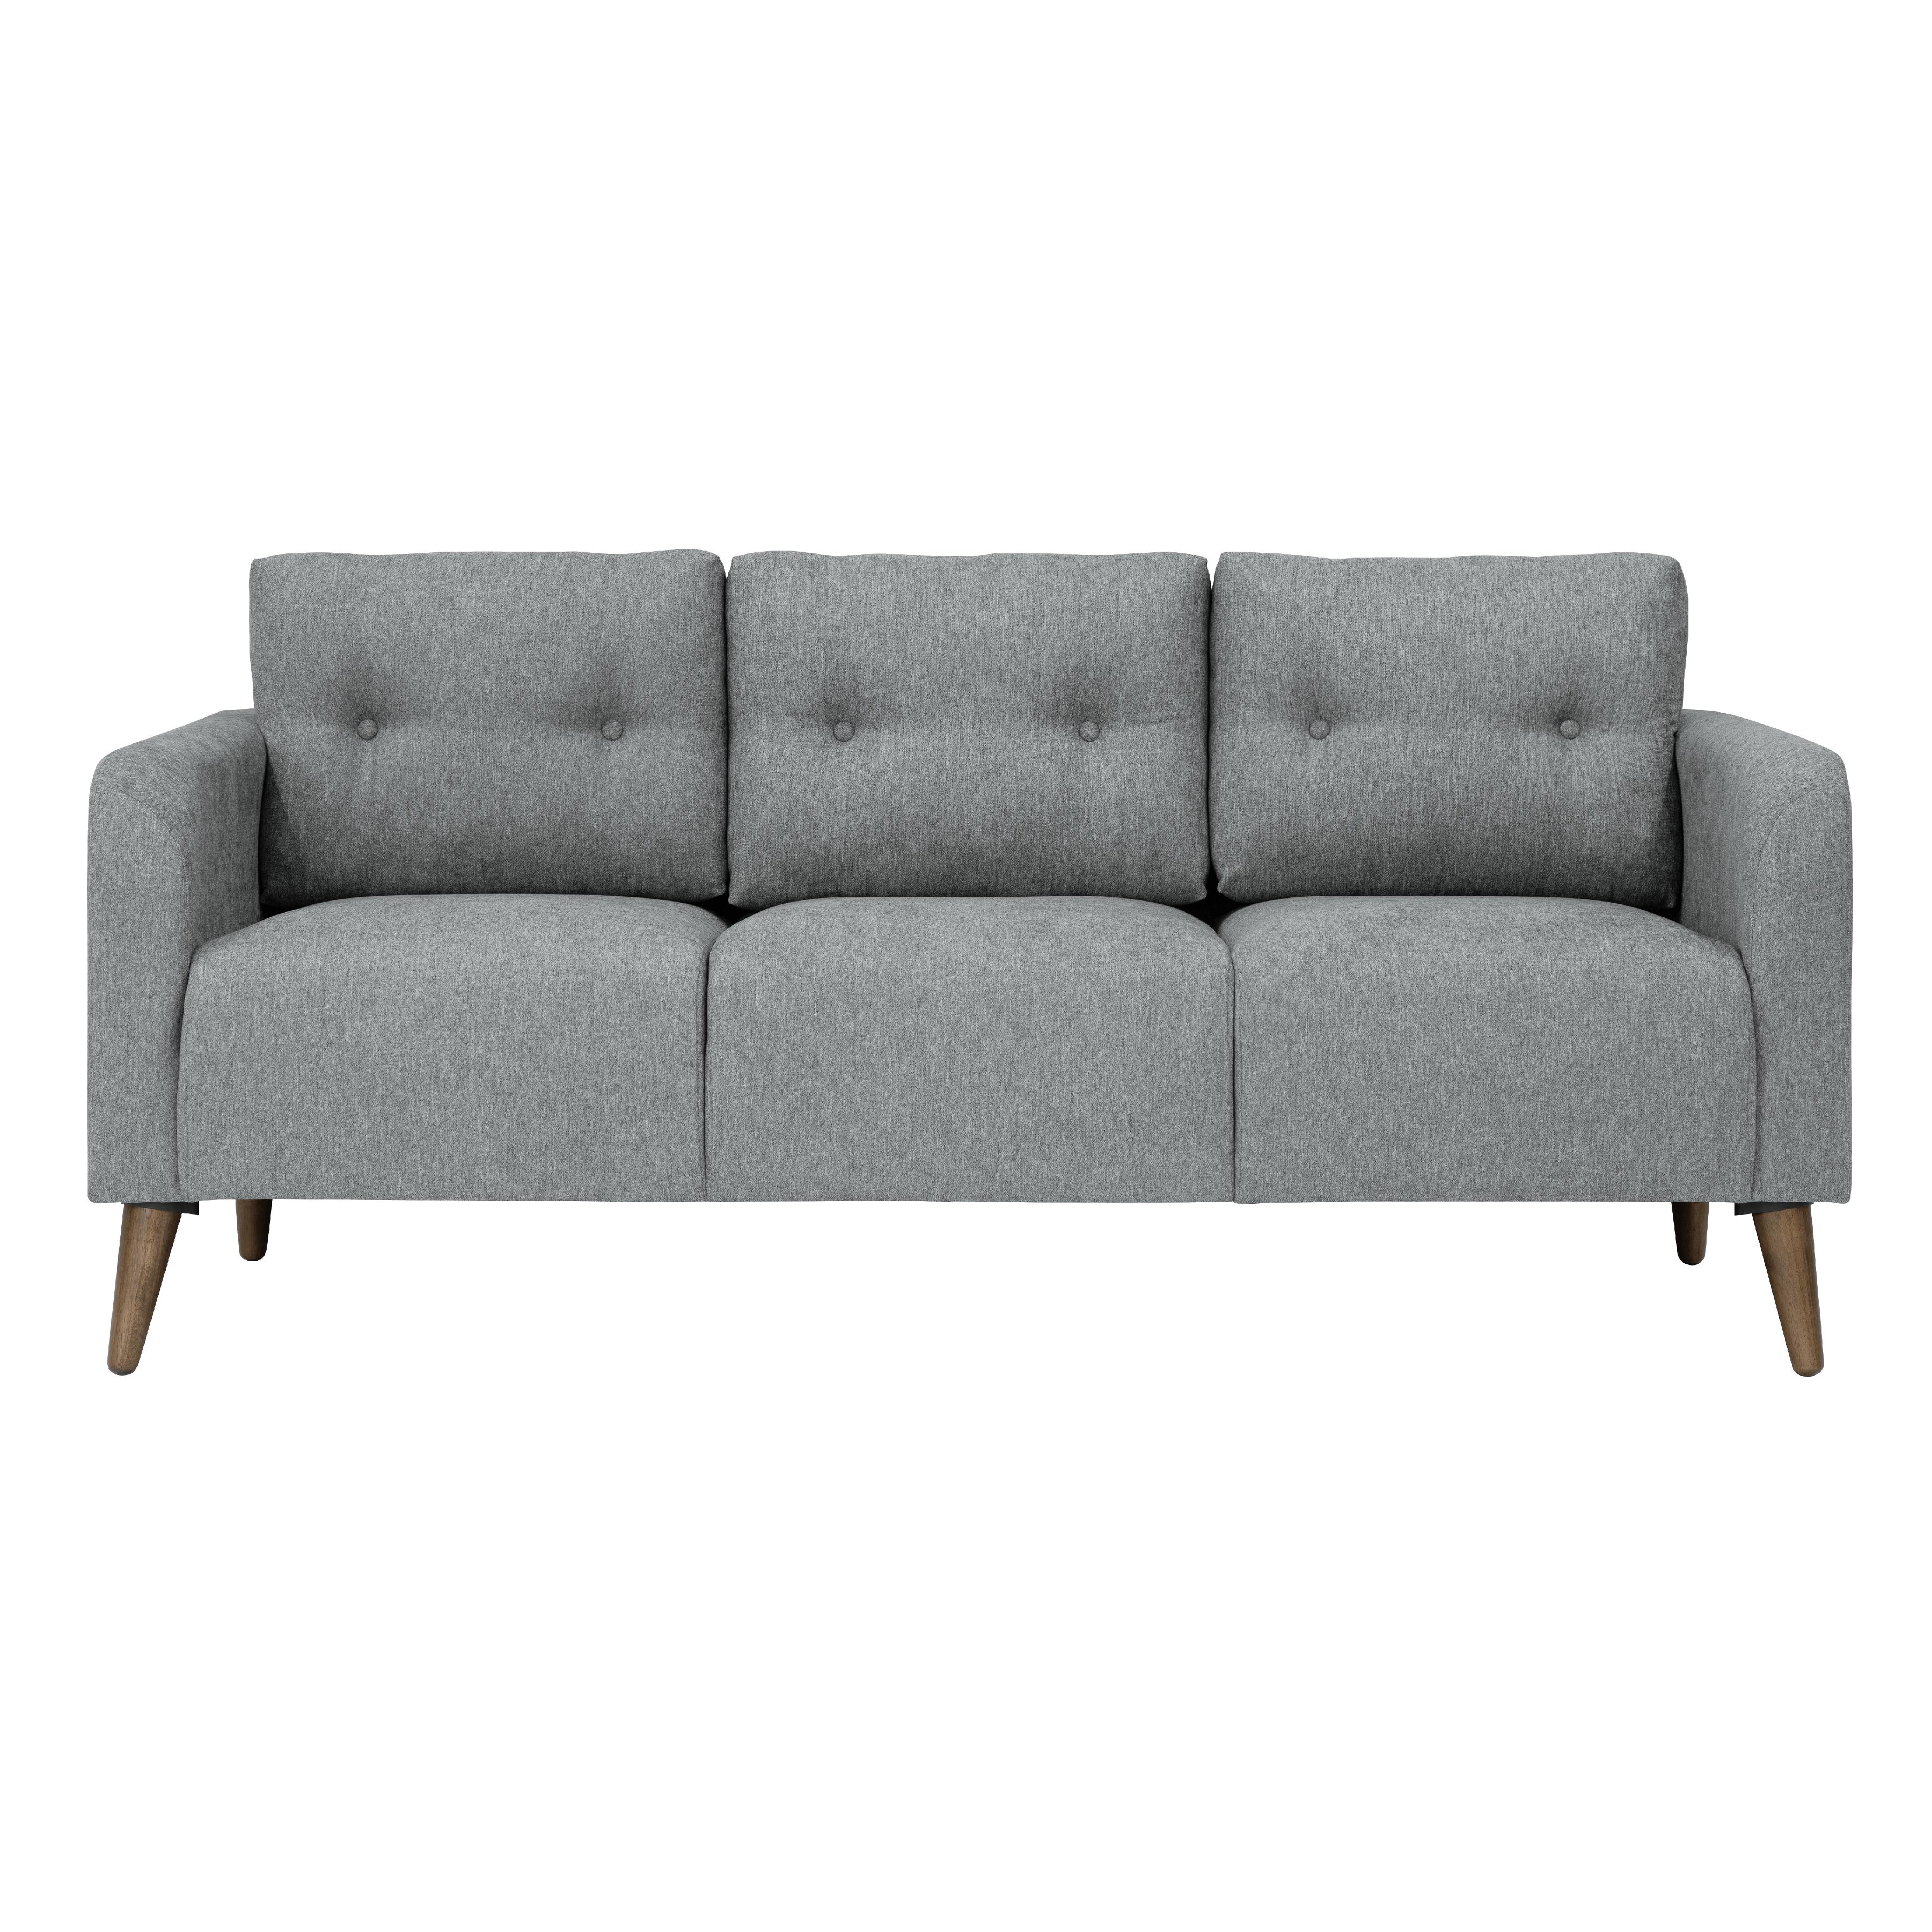 Hipvan Bennett 3 Seater Sofa Slate 3 Seater Sofa Sofa